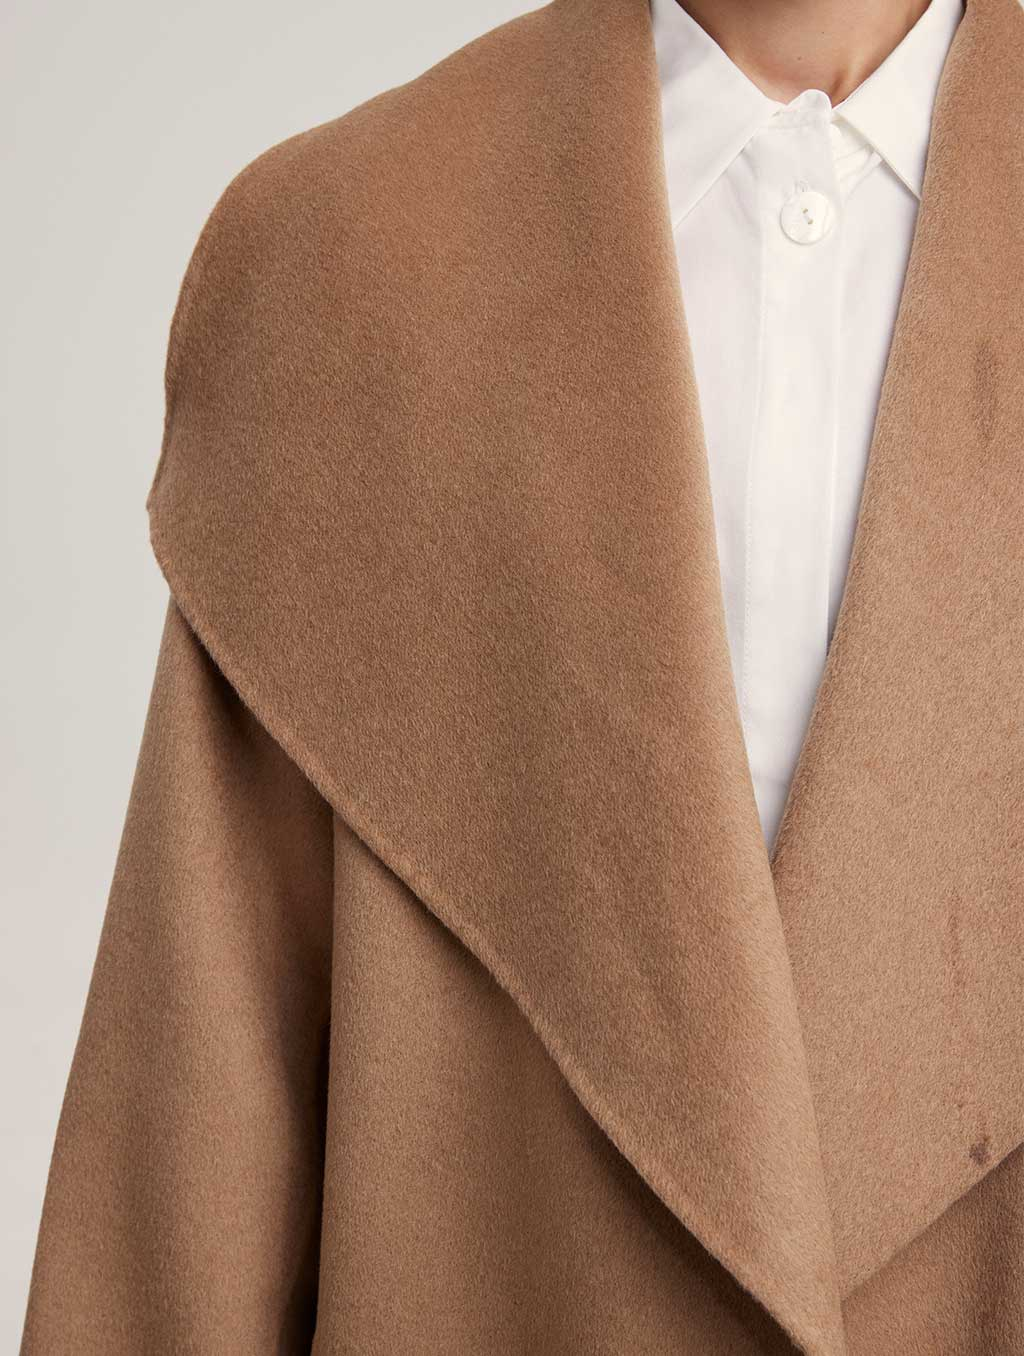 Waisted Belted 100% Camel Hair Coat - detail- Camel